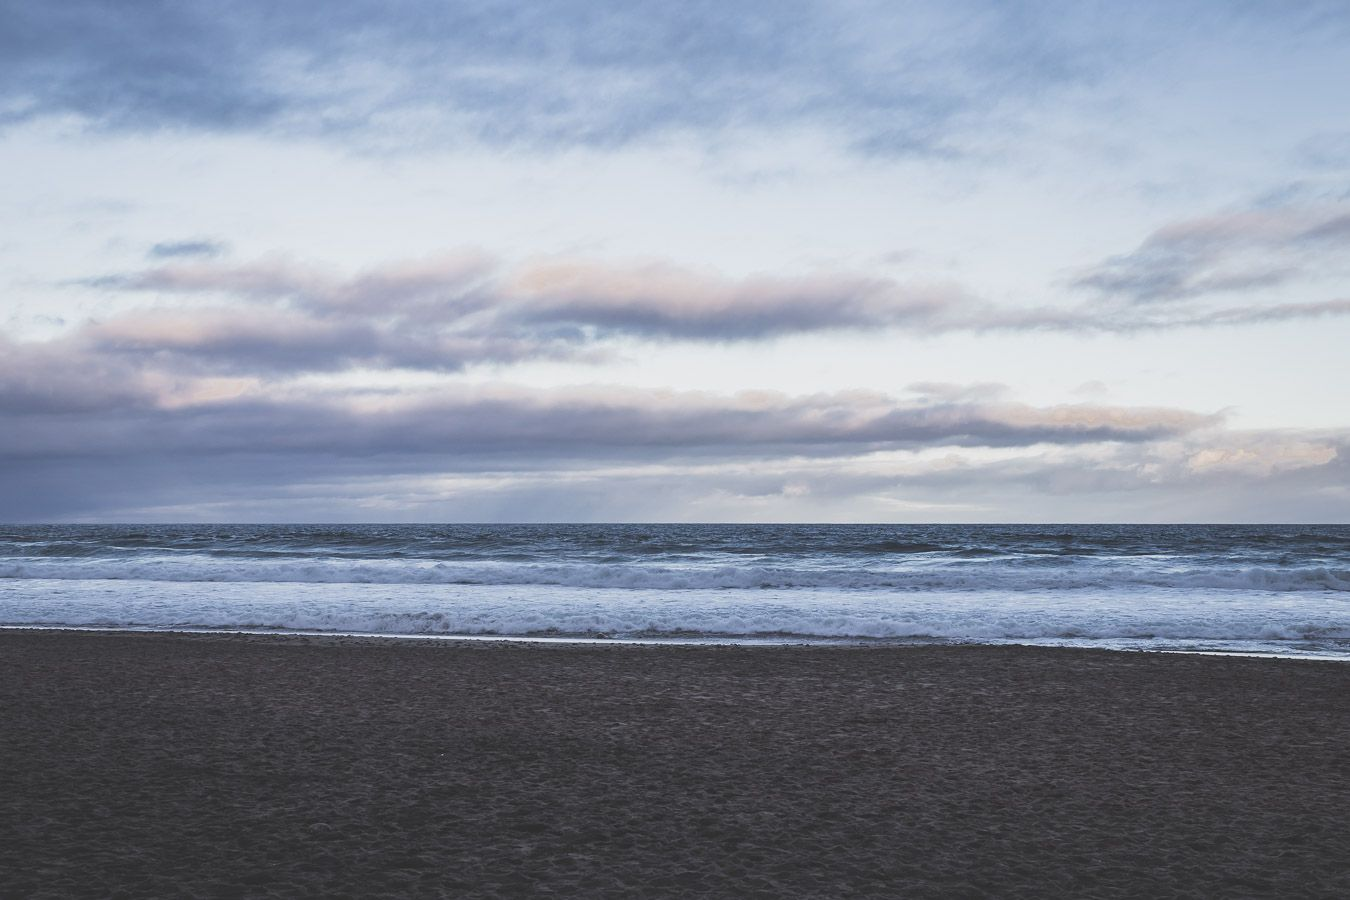 plage du Pays basque espagnol